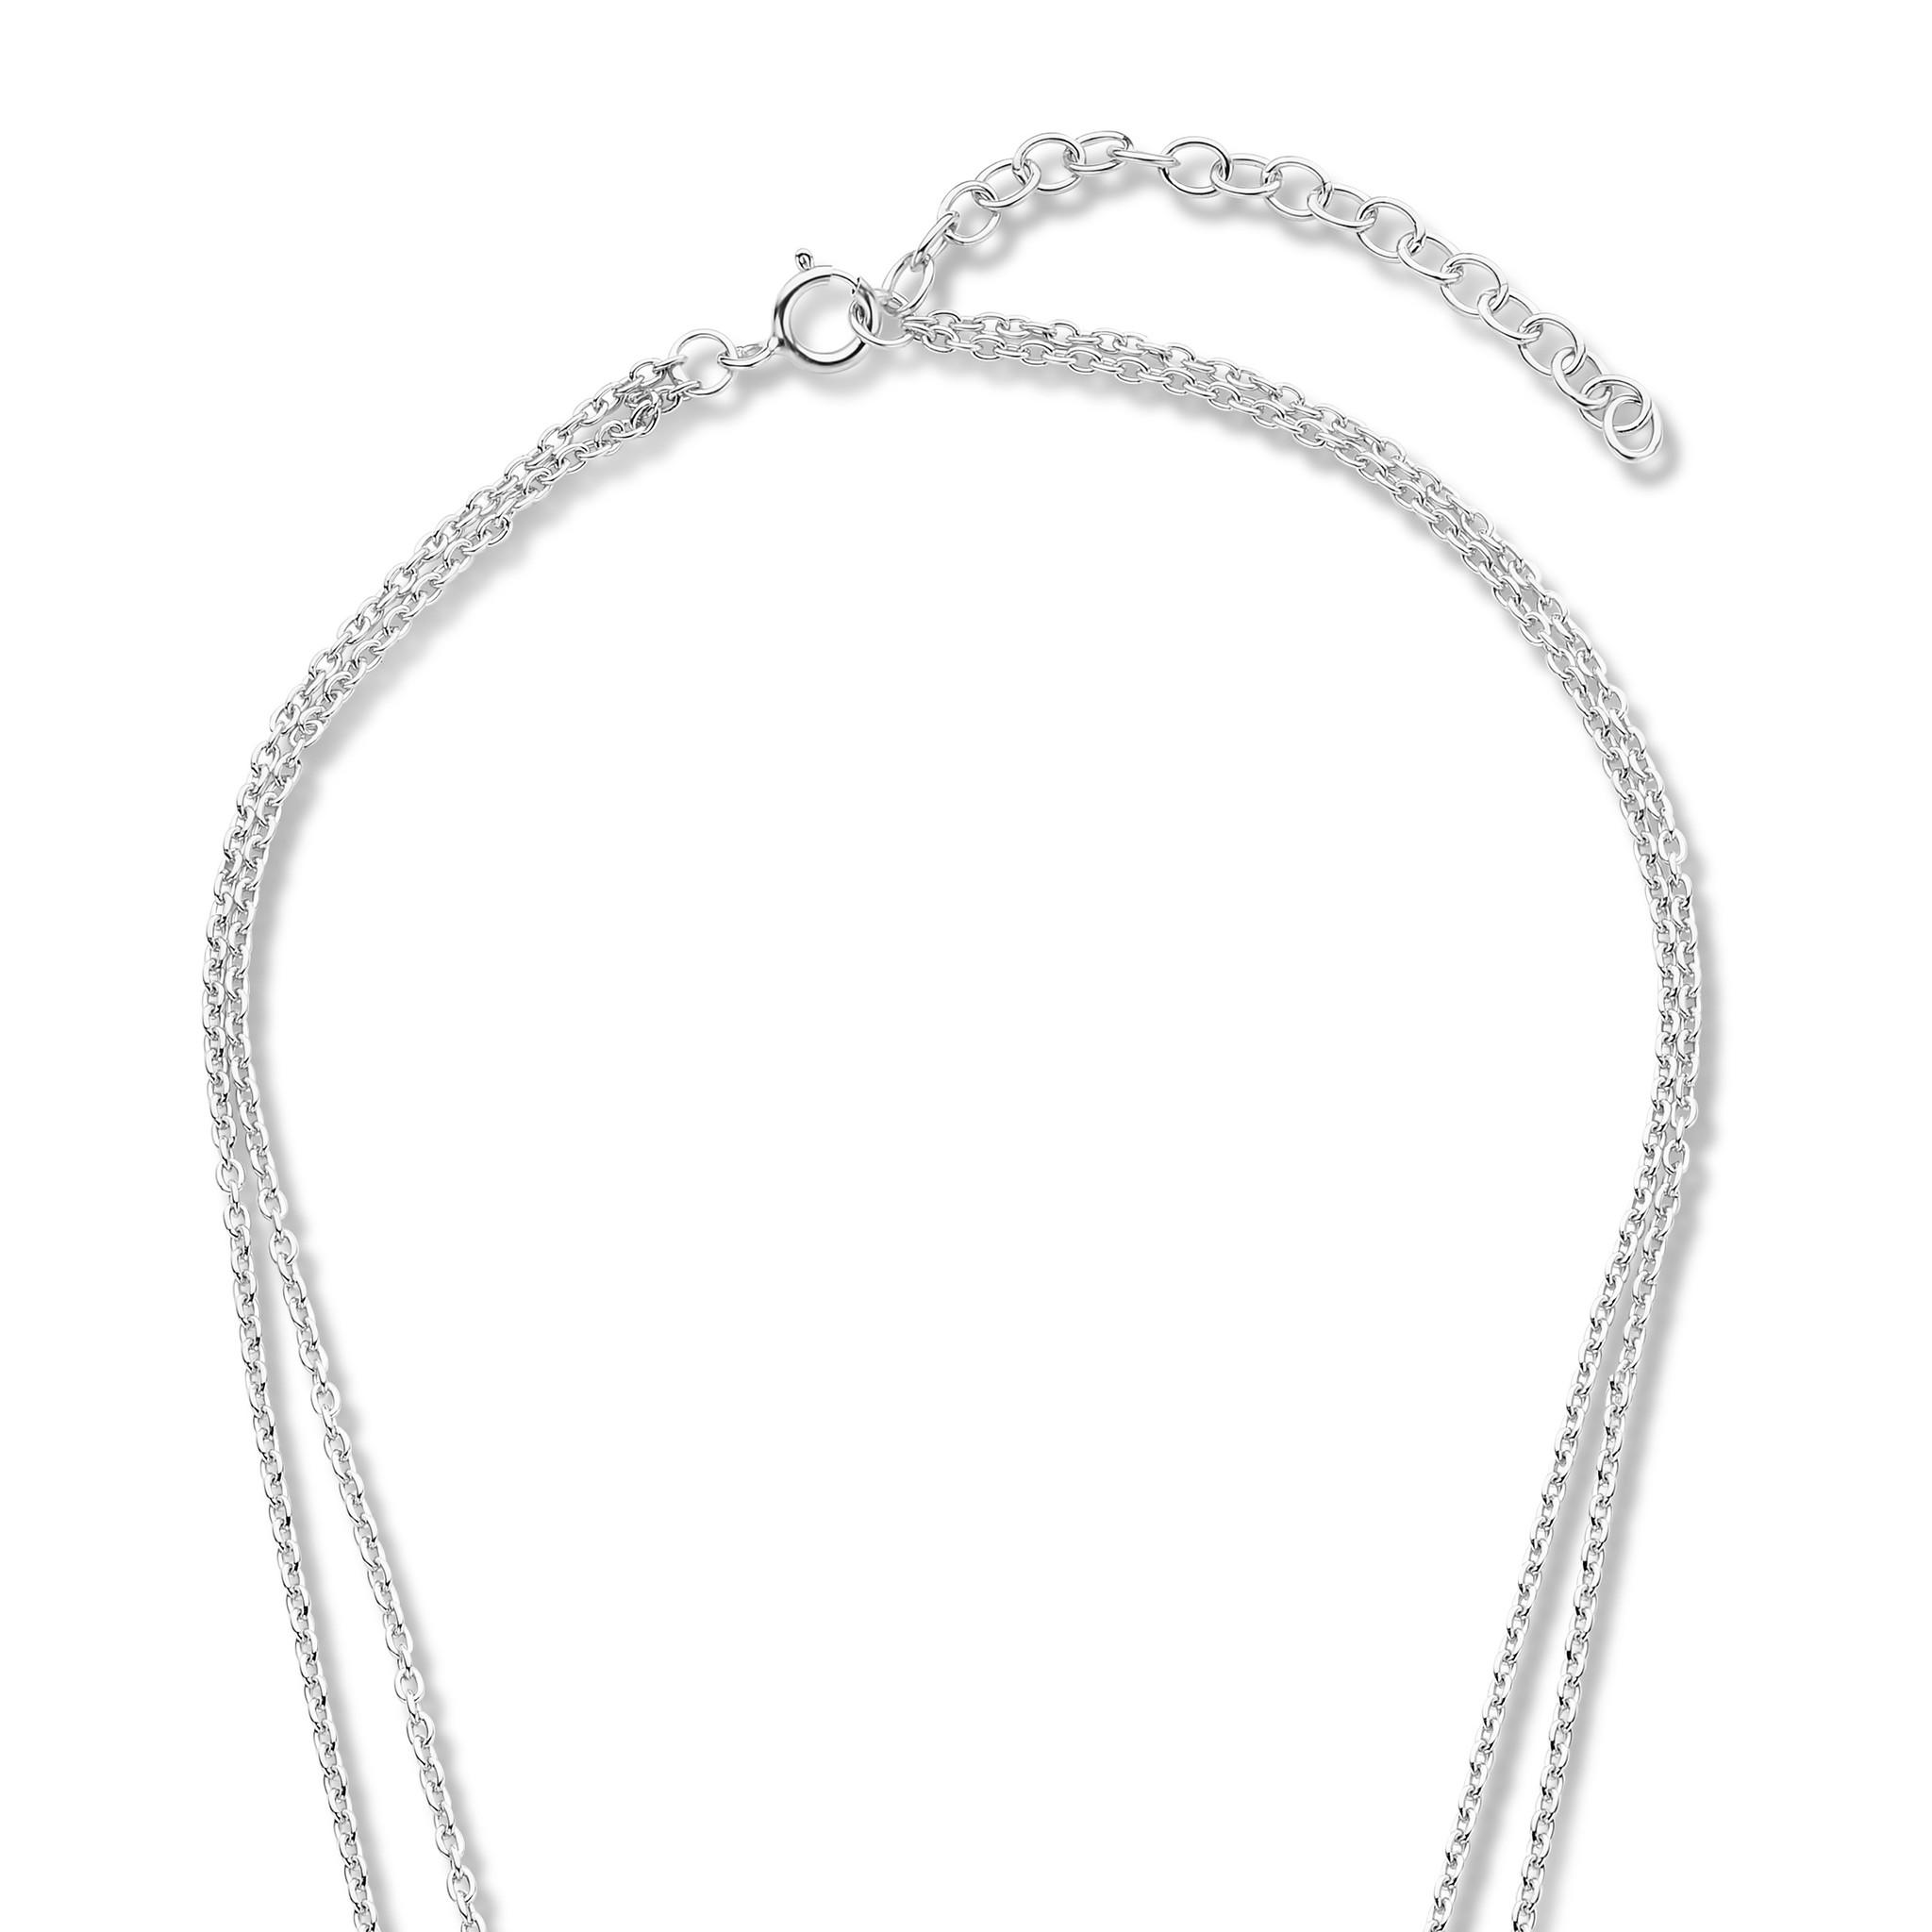 Violet Hamden Luna 925 sterling silver necklace with moons